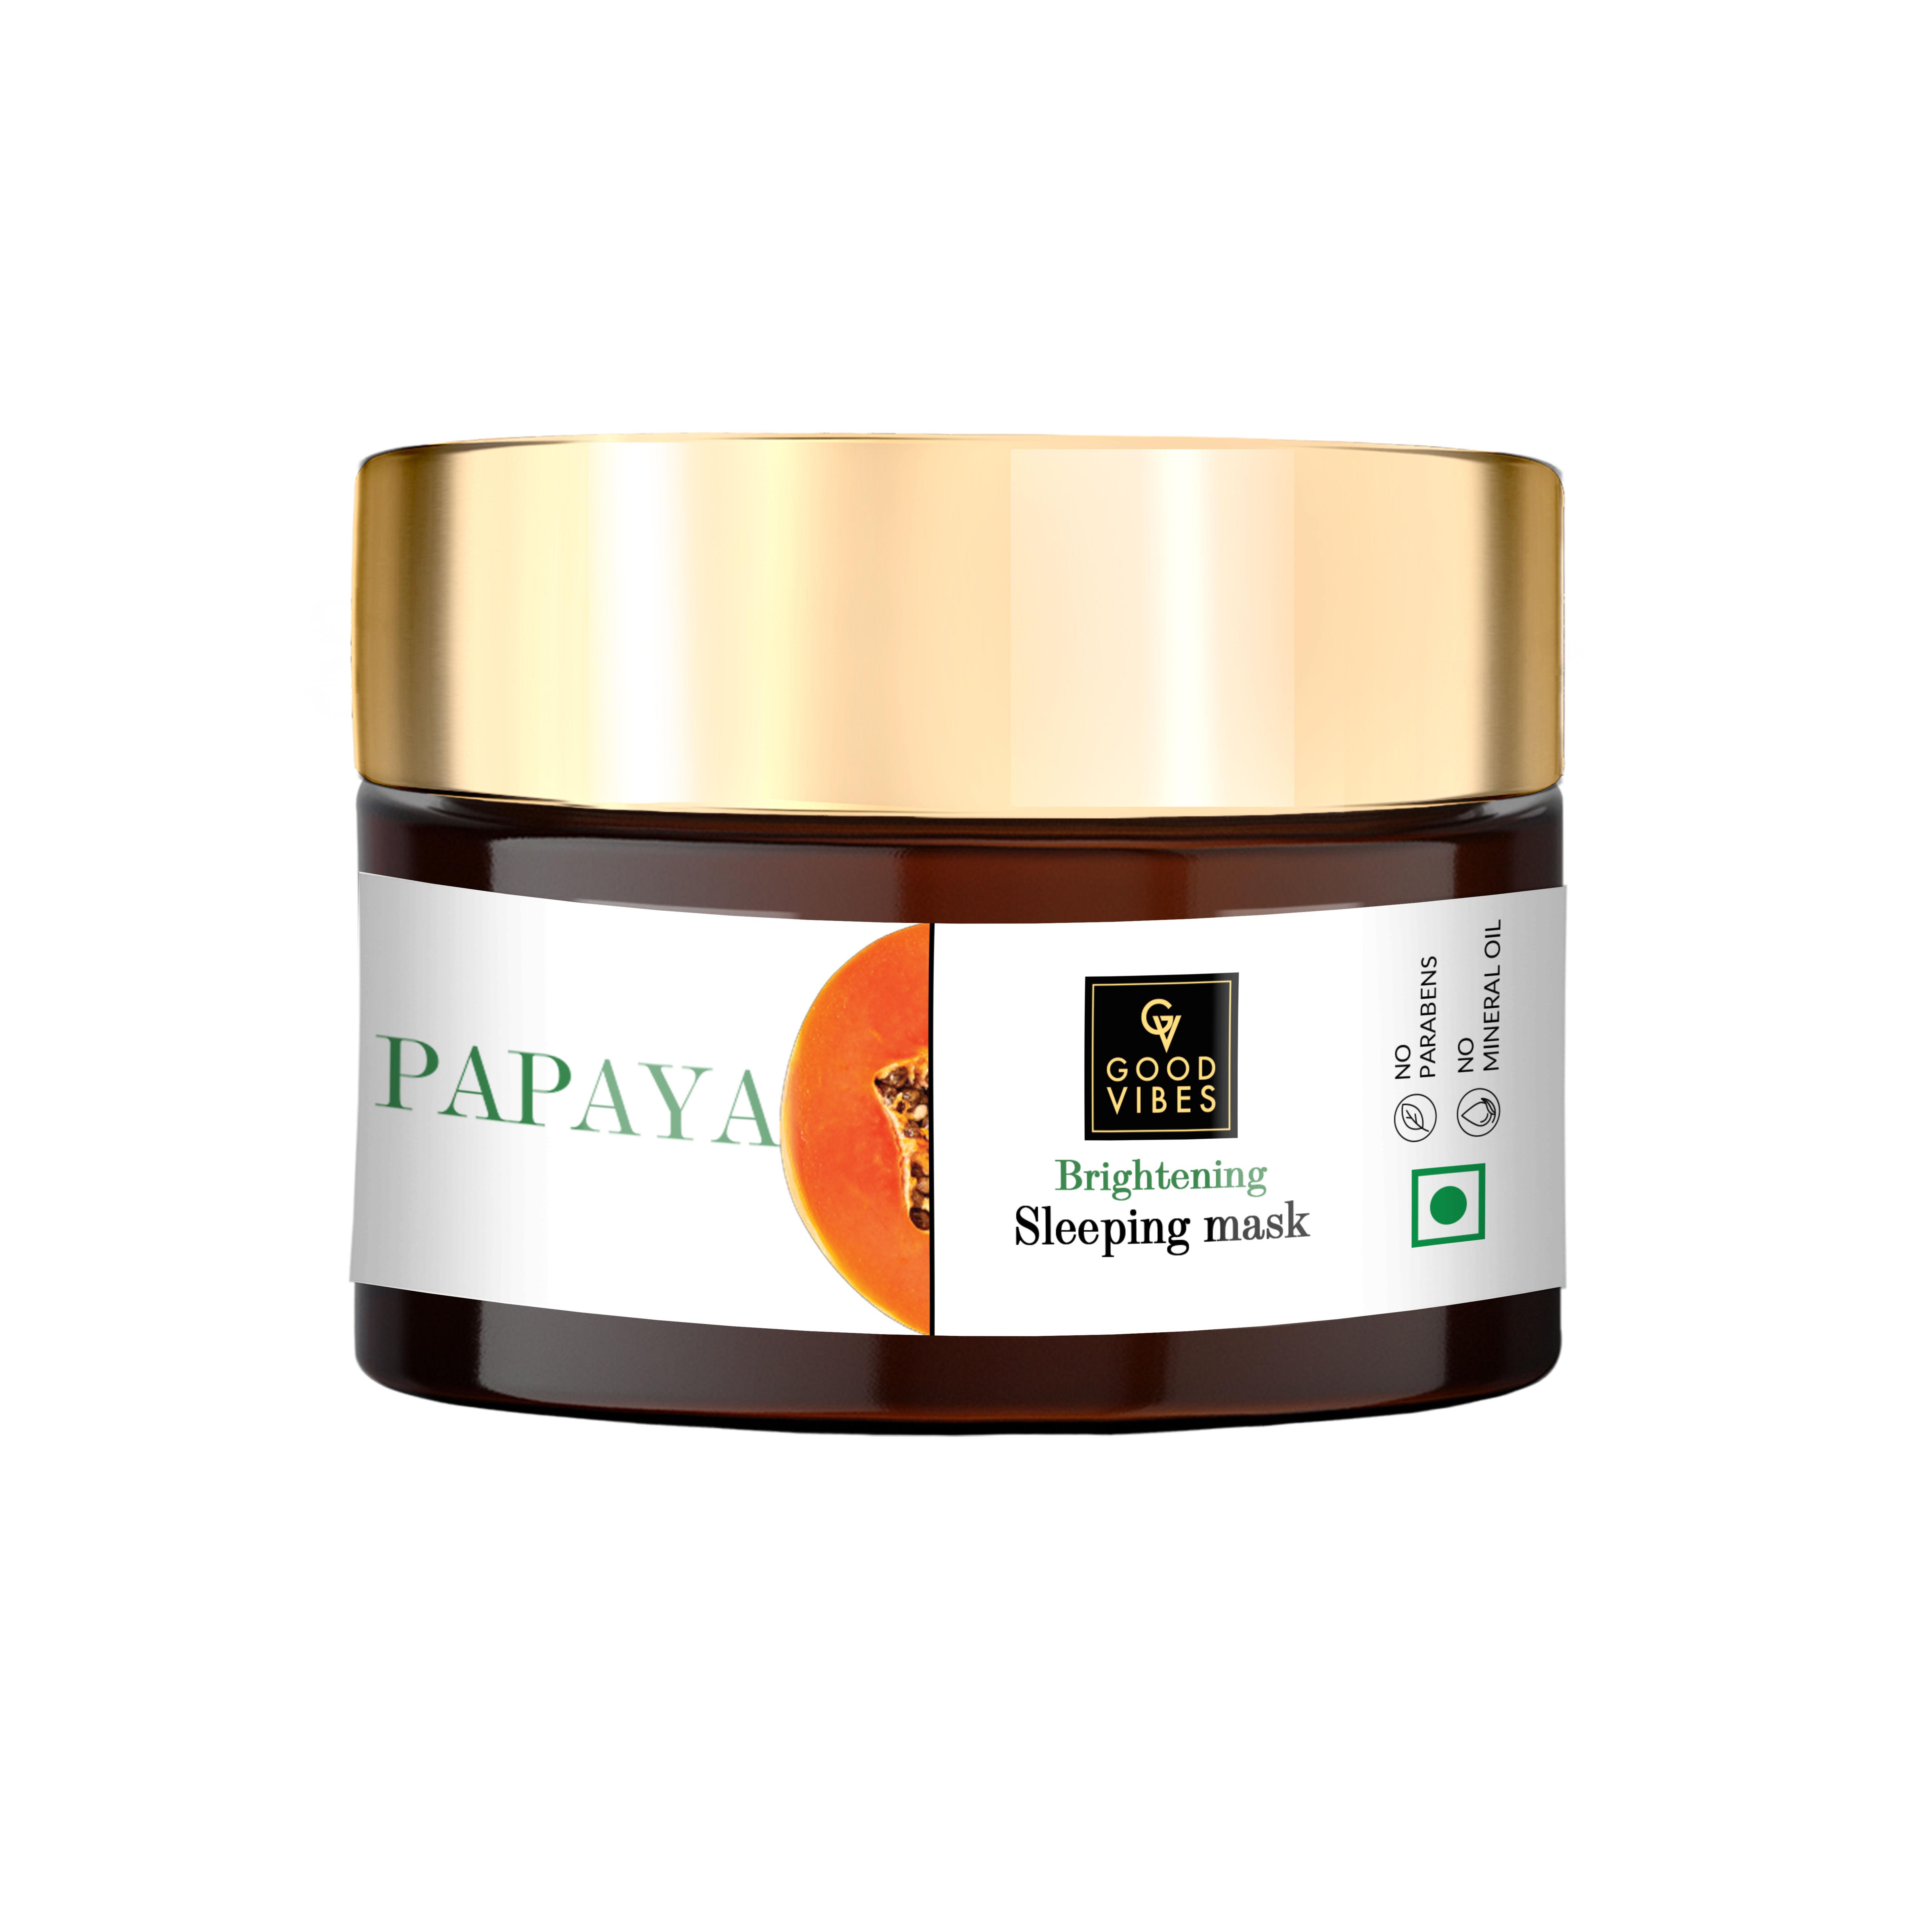 Good Vibes | Good Vibes Papaya Brightening Sleeping Mask (50 g)